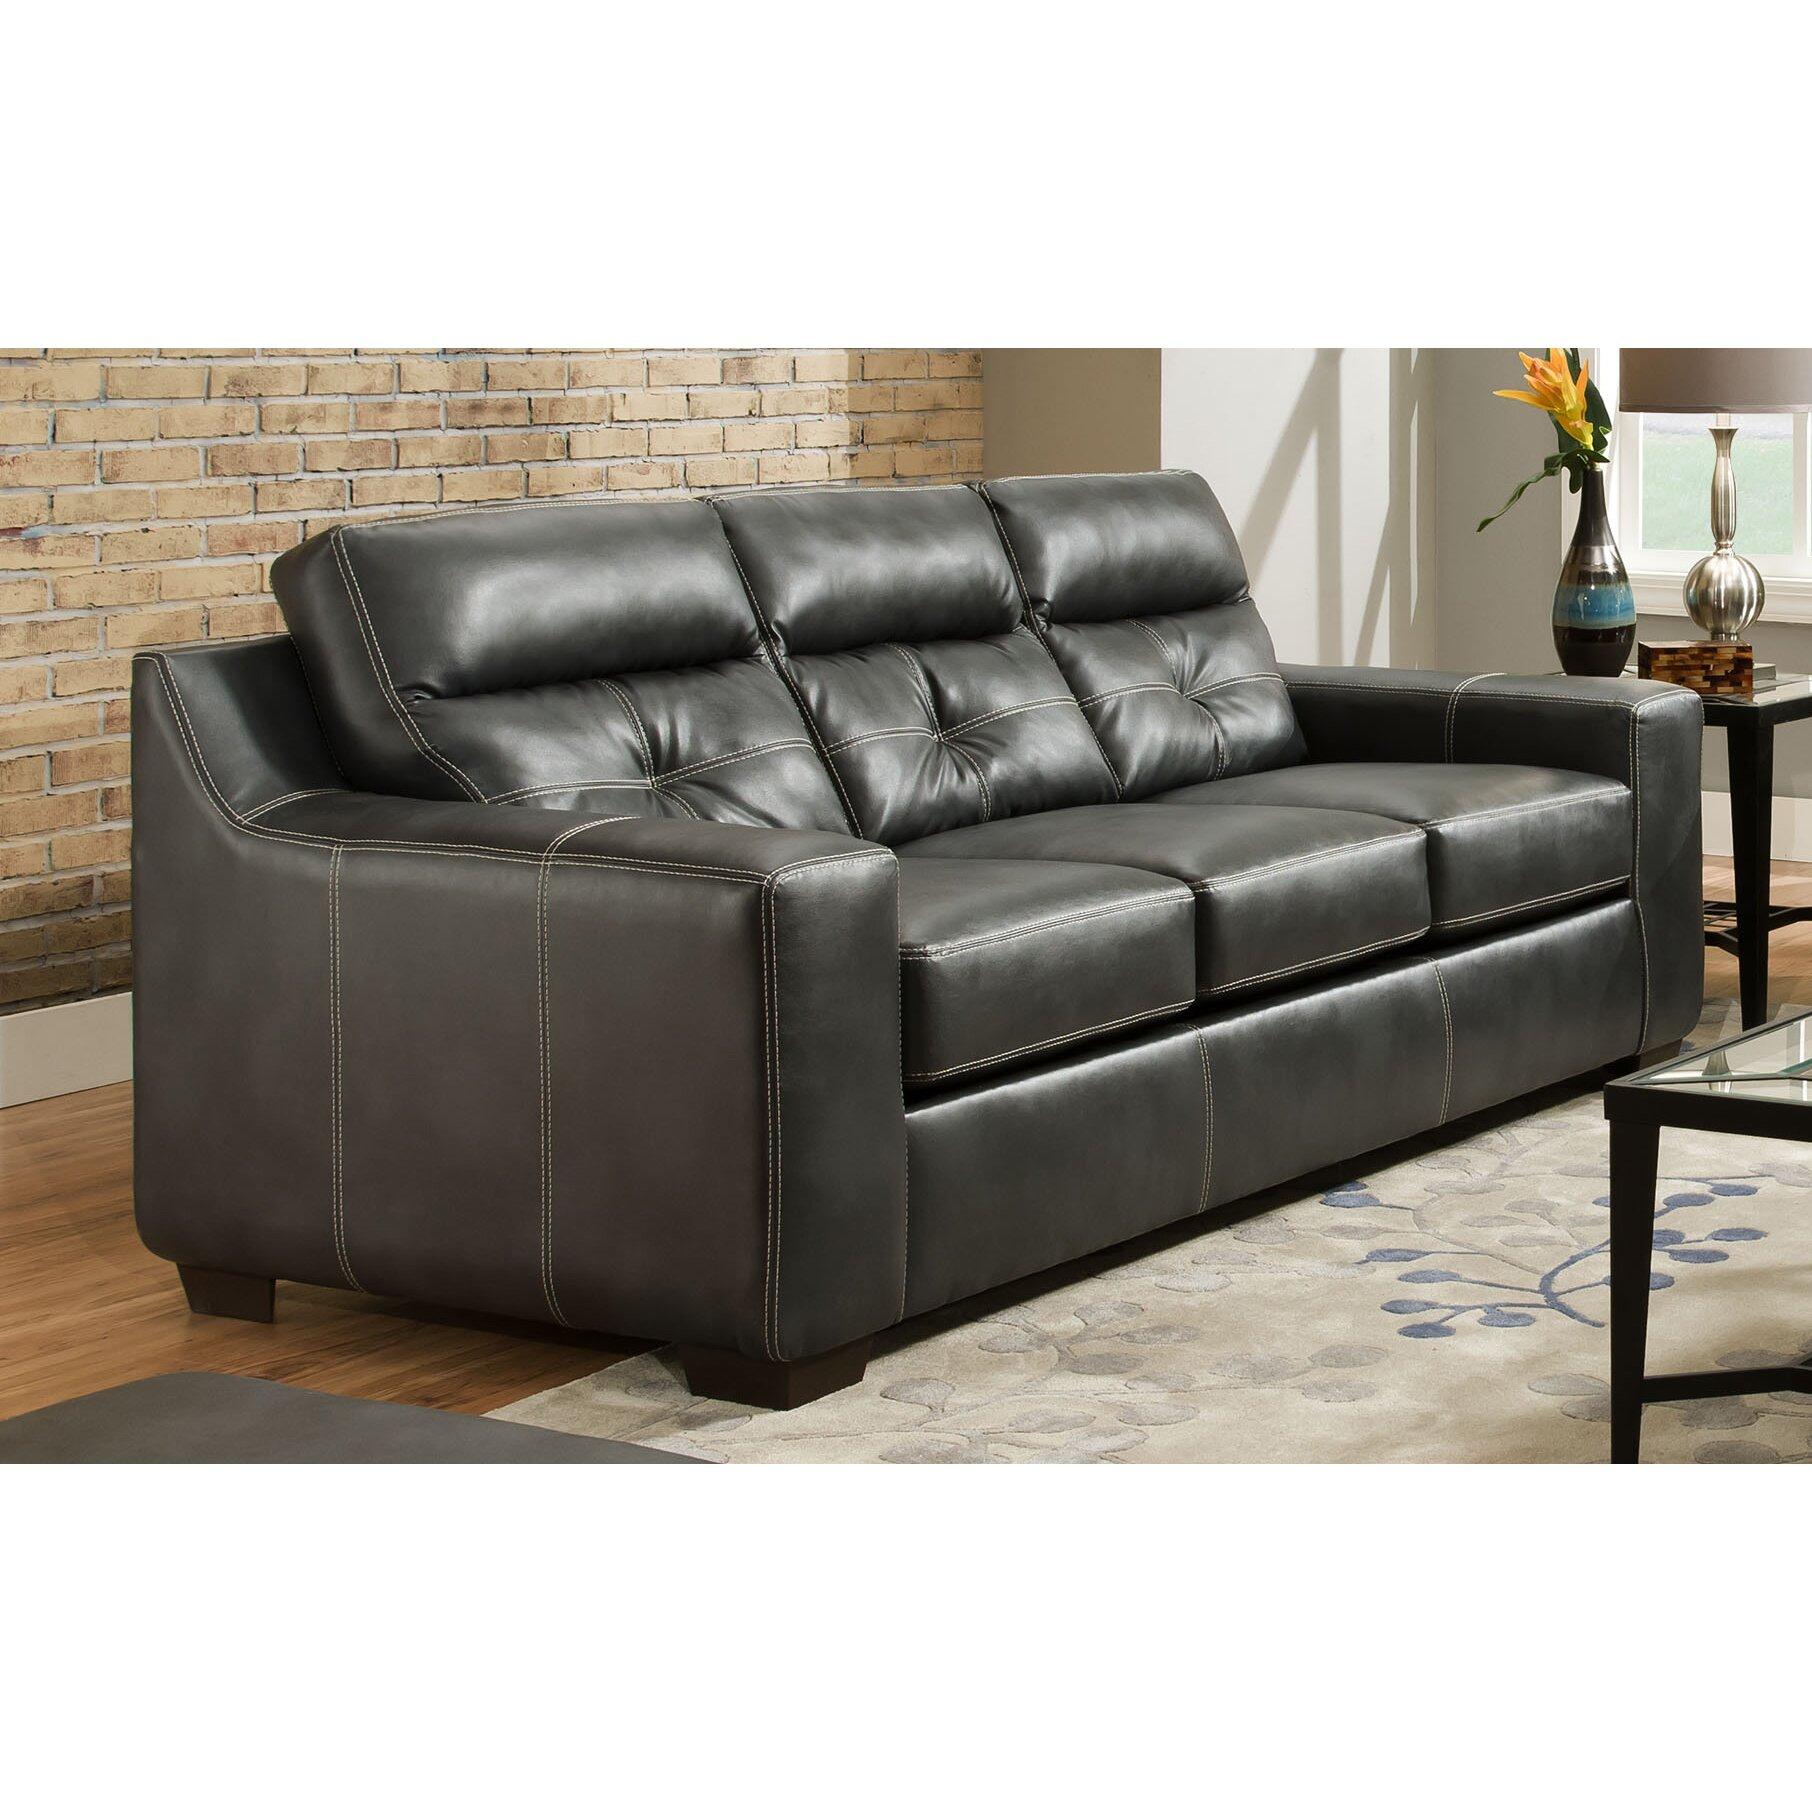 Chelsea home aragon leather sofa wayfair for Chelsea leather sofa